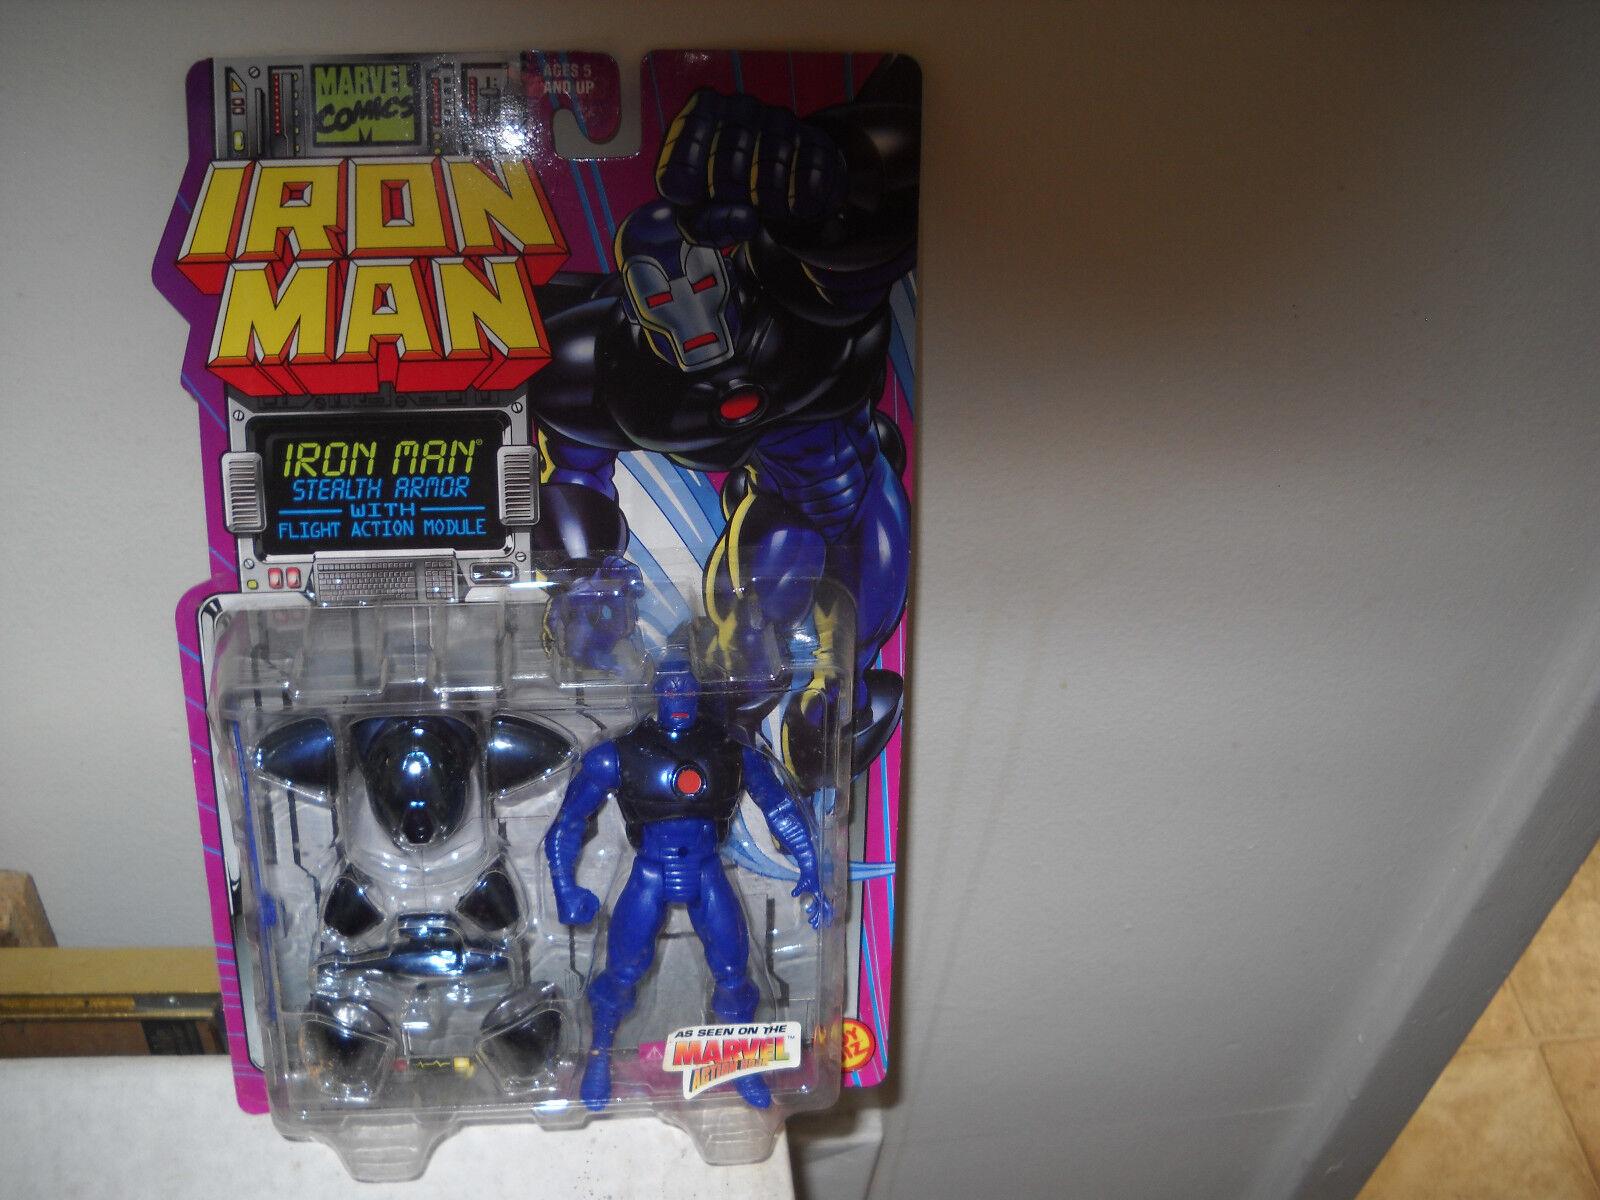 Iron Man Action Figure-Iron Man-Stealth Armor vf nm on Card